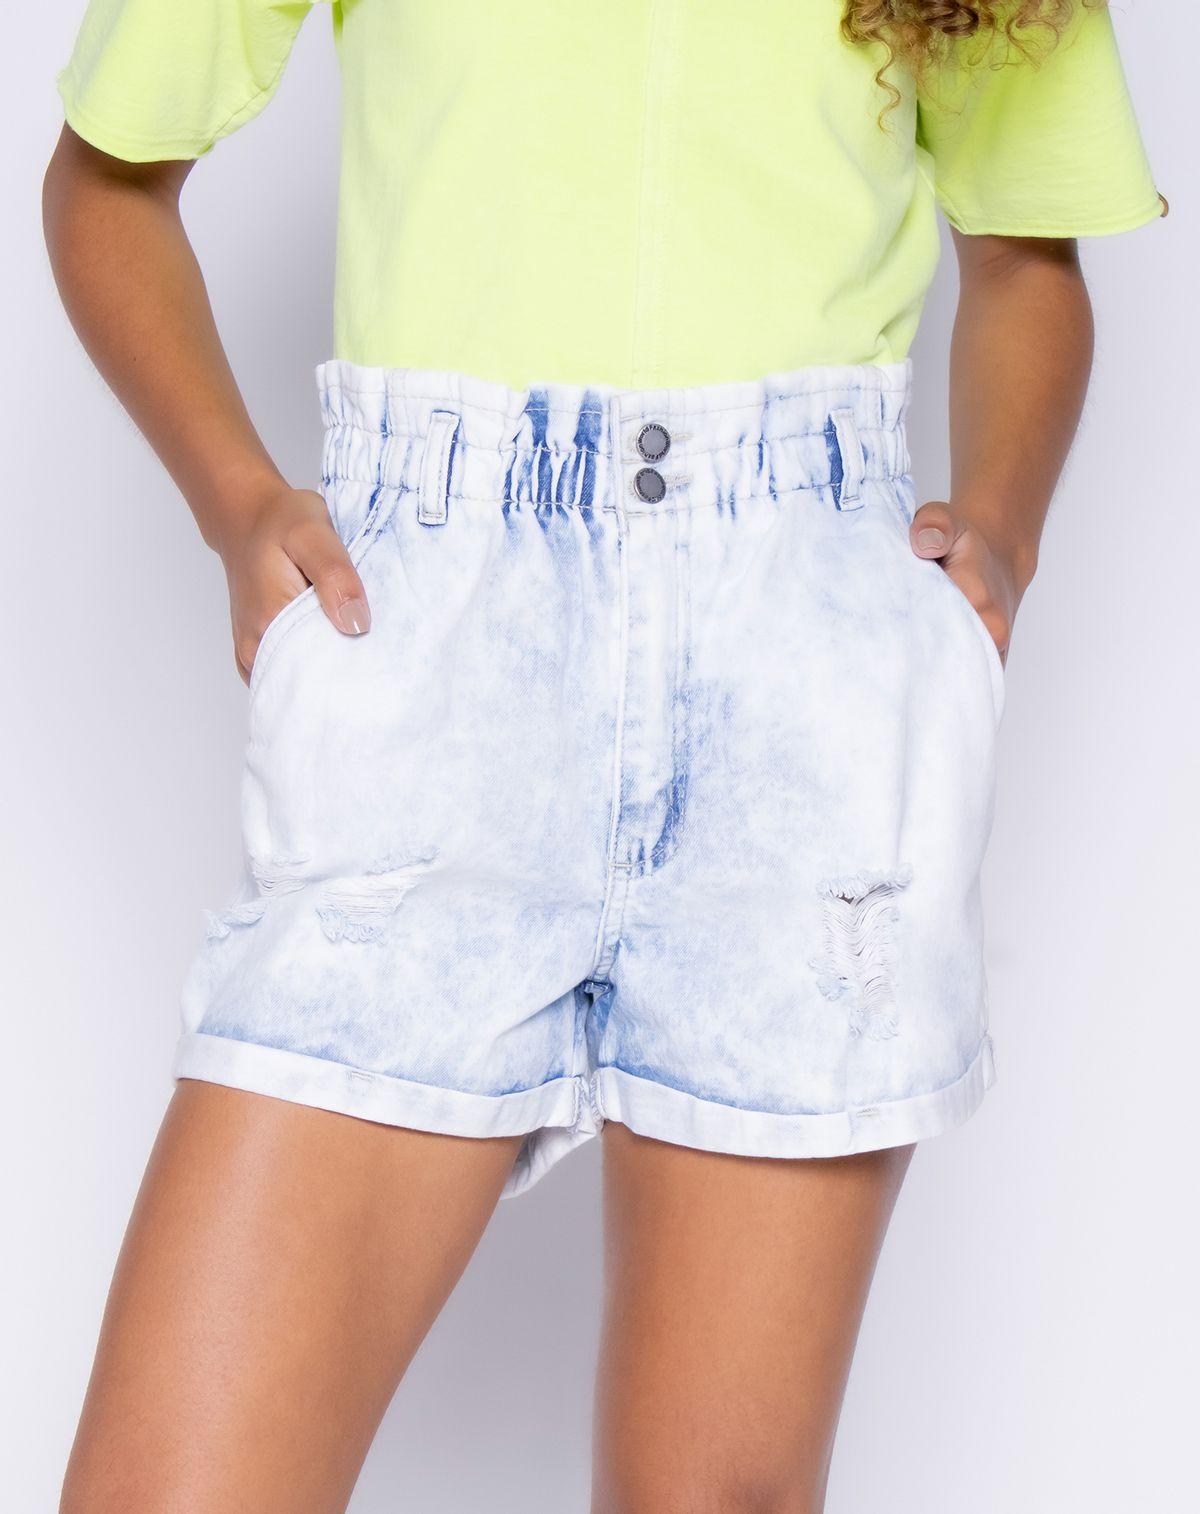 598267007-short-jeans-clochard-feminino-barra-dobrada-jeans-medio-36-8e7